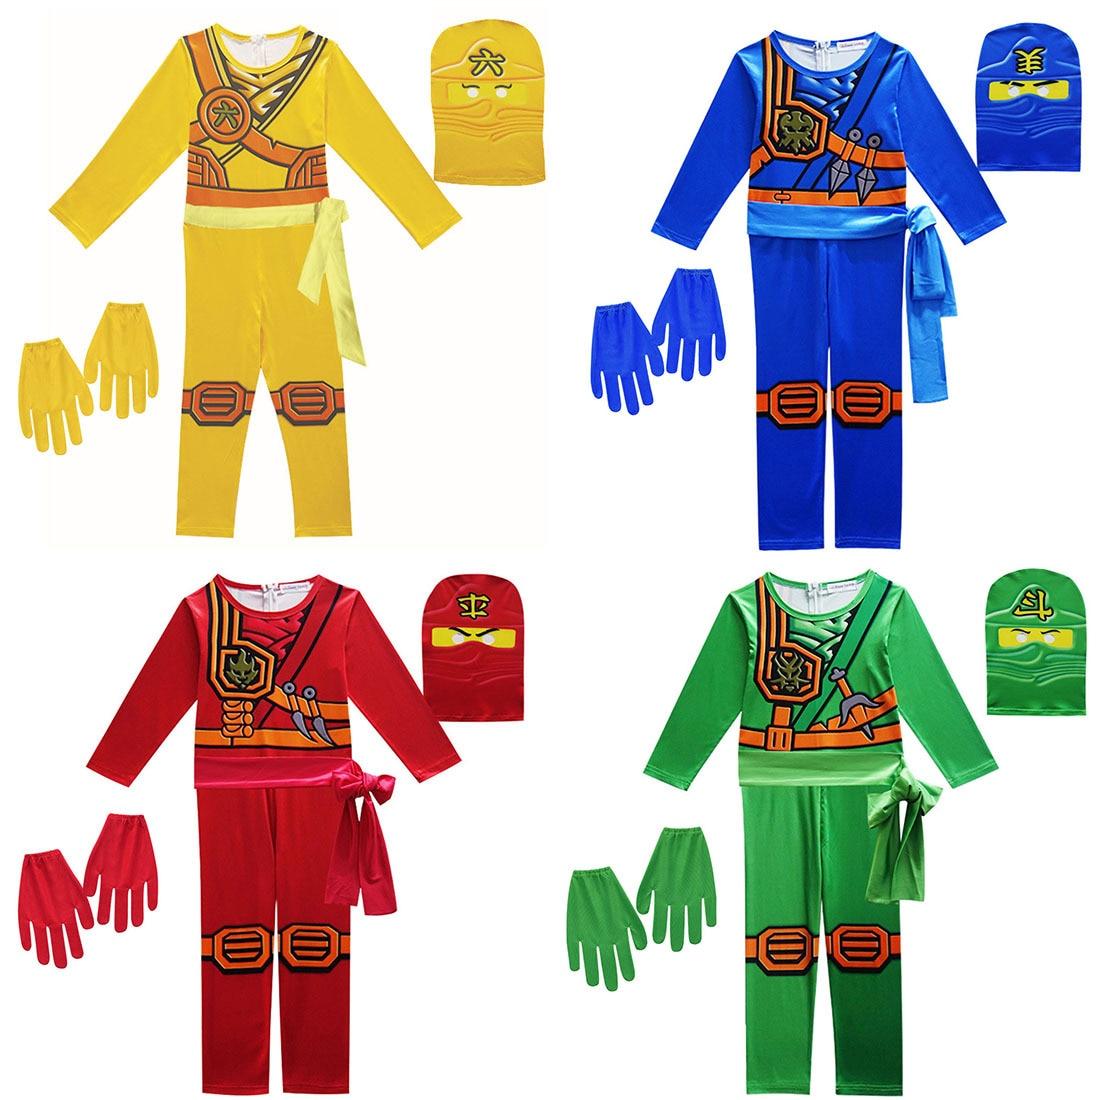 Kids Girls Boys Ninjago Cosplay Costume Mask Jumpsuit Set Boys Girls Ninja Costume Halloween Christmas Party Clothing For Boy